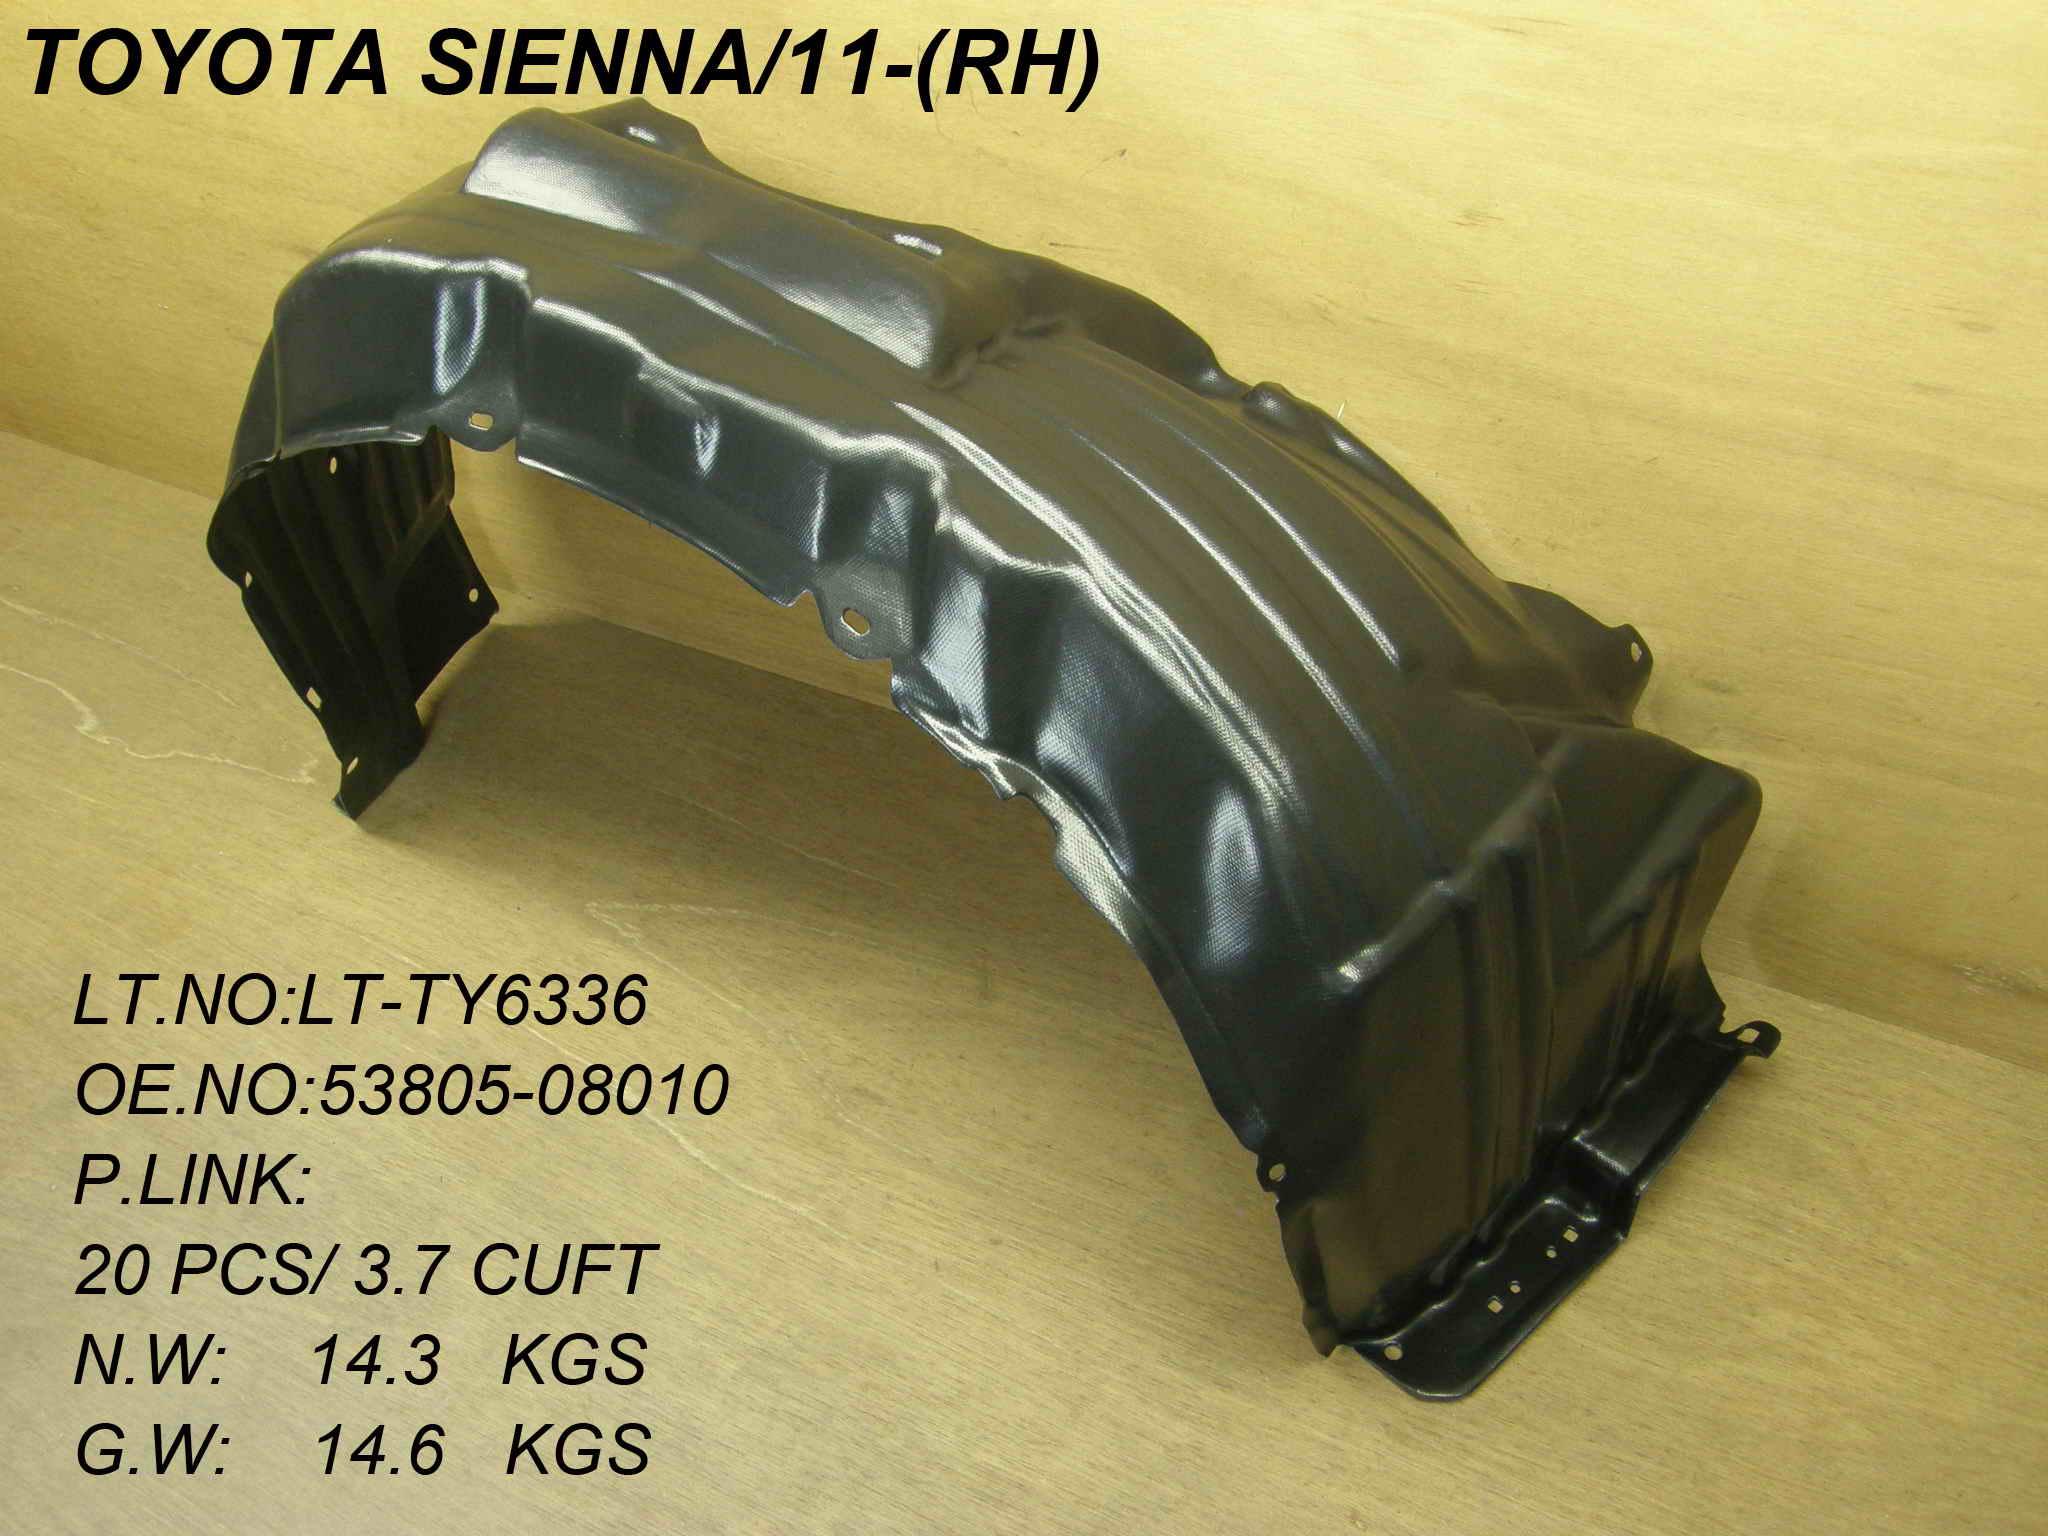 Fender For 2011-2014 Toyota Sienna Front Passenger Primed Steel w// Antenna Hole